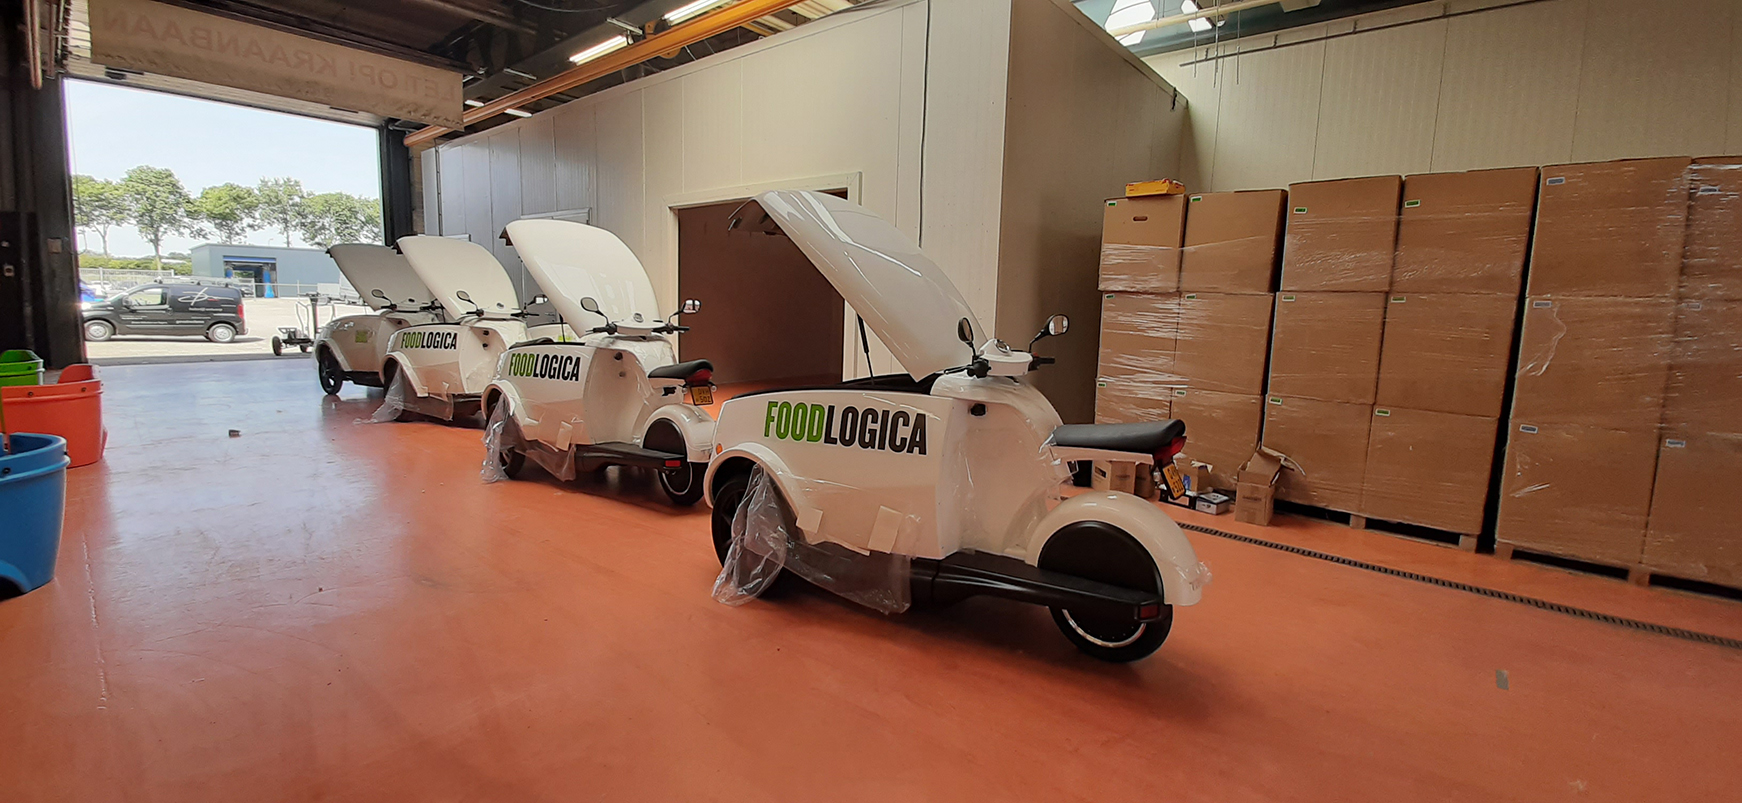 Tripl wagenpark Foodlogica